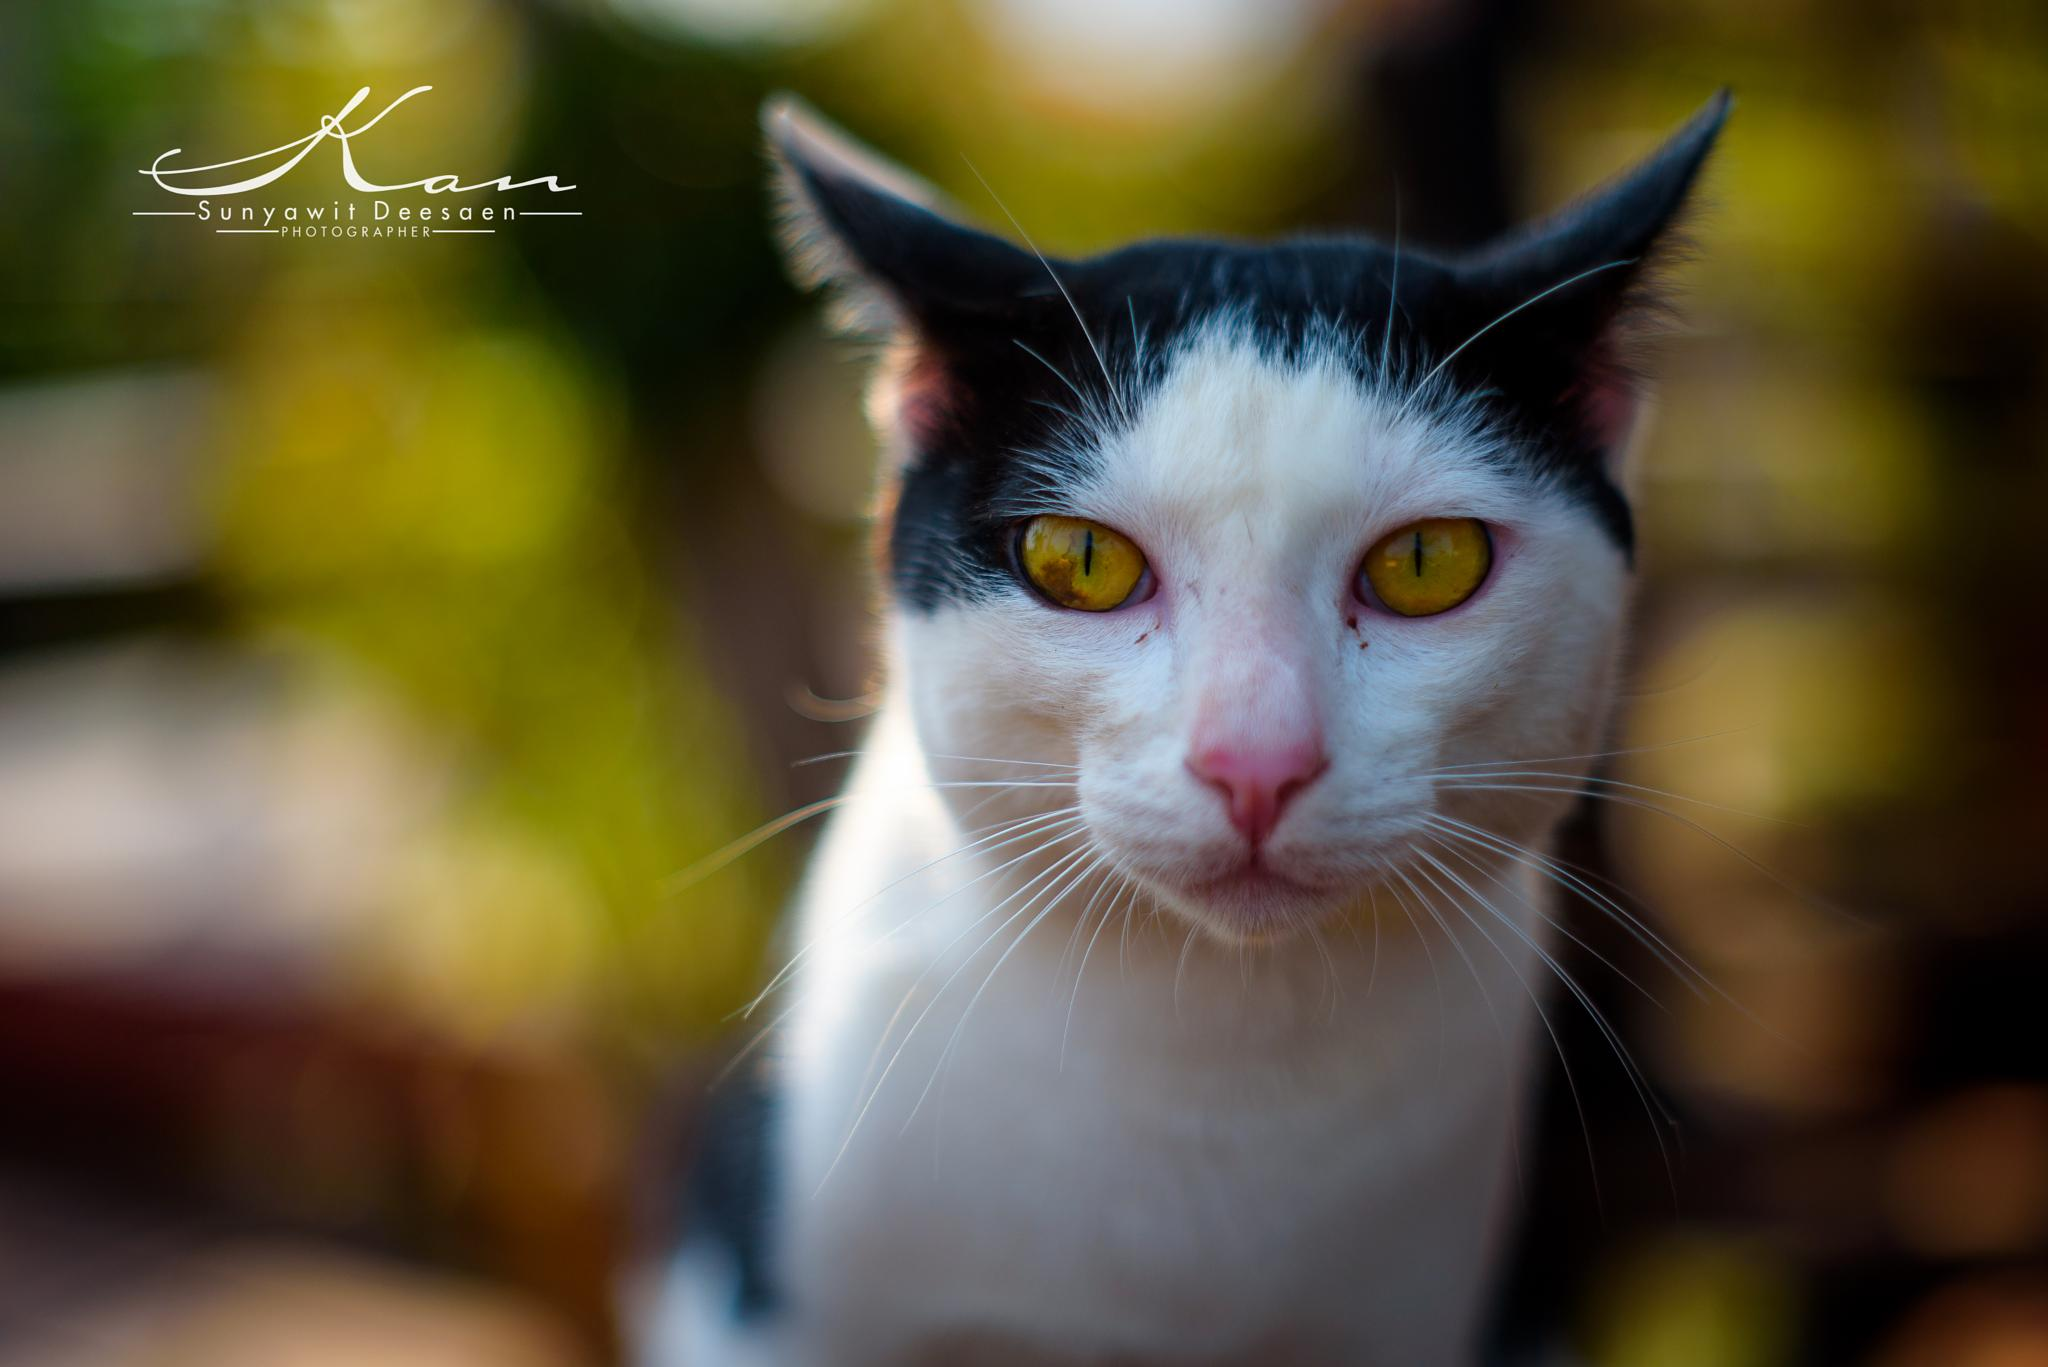 Cat by Sunyawit D.